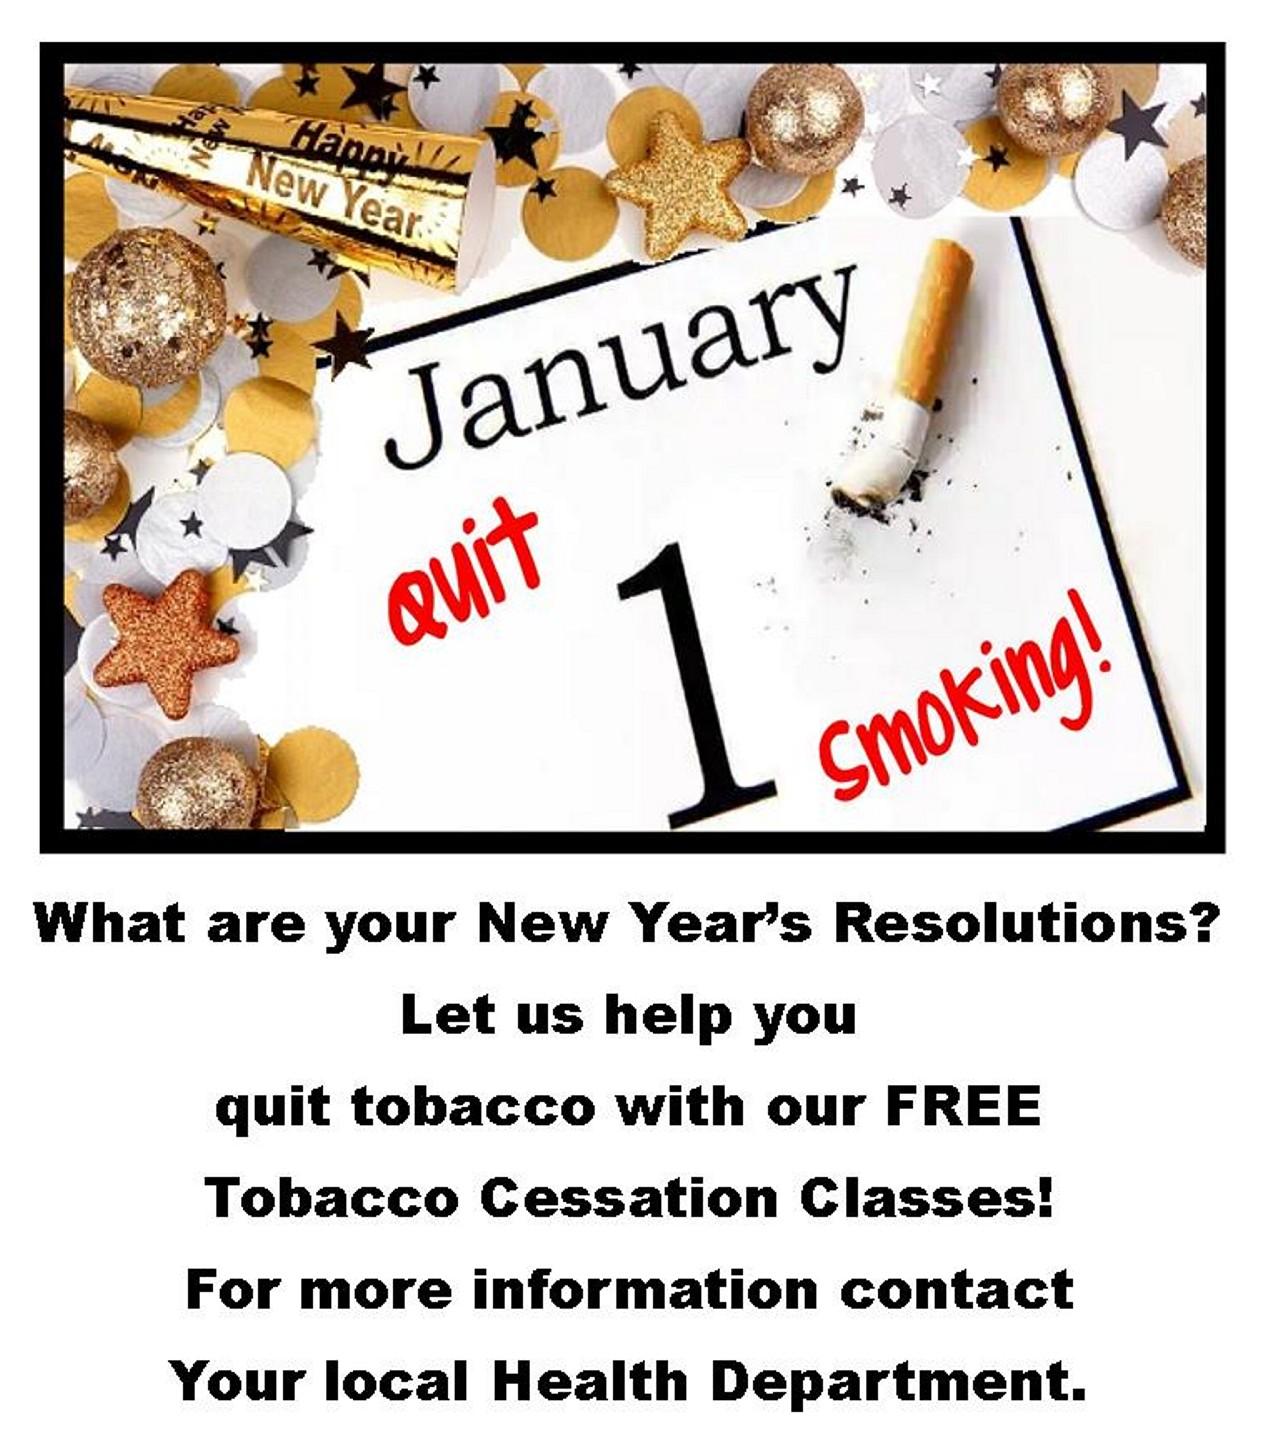 AD 2020-12 Health - Quit Tobacco Free